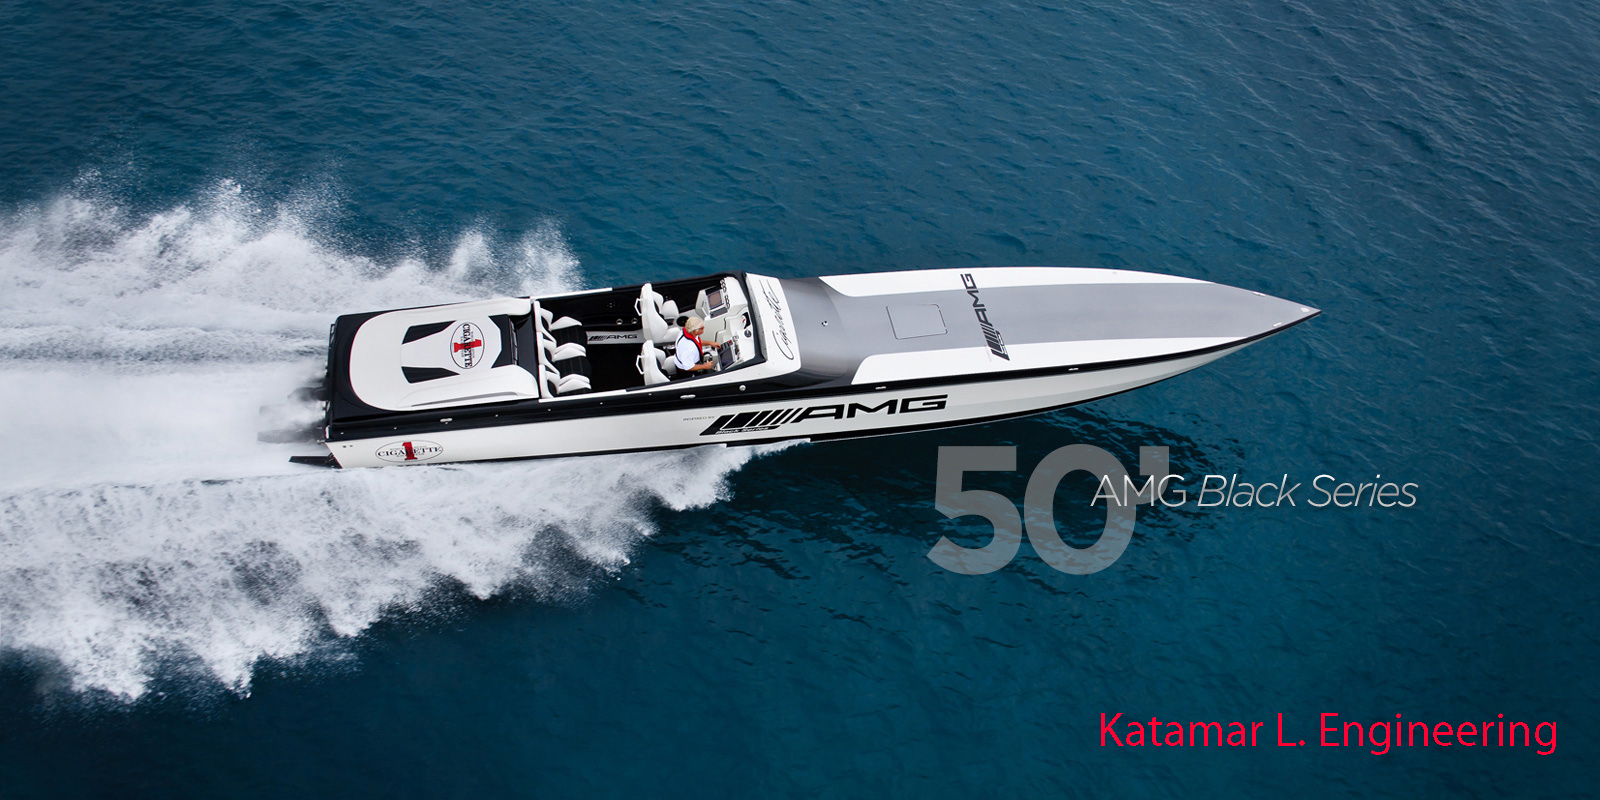 50 39 amg black series yacht powerboats. Black Bedroom Furniture Sets. Home Design Ideas